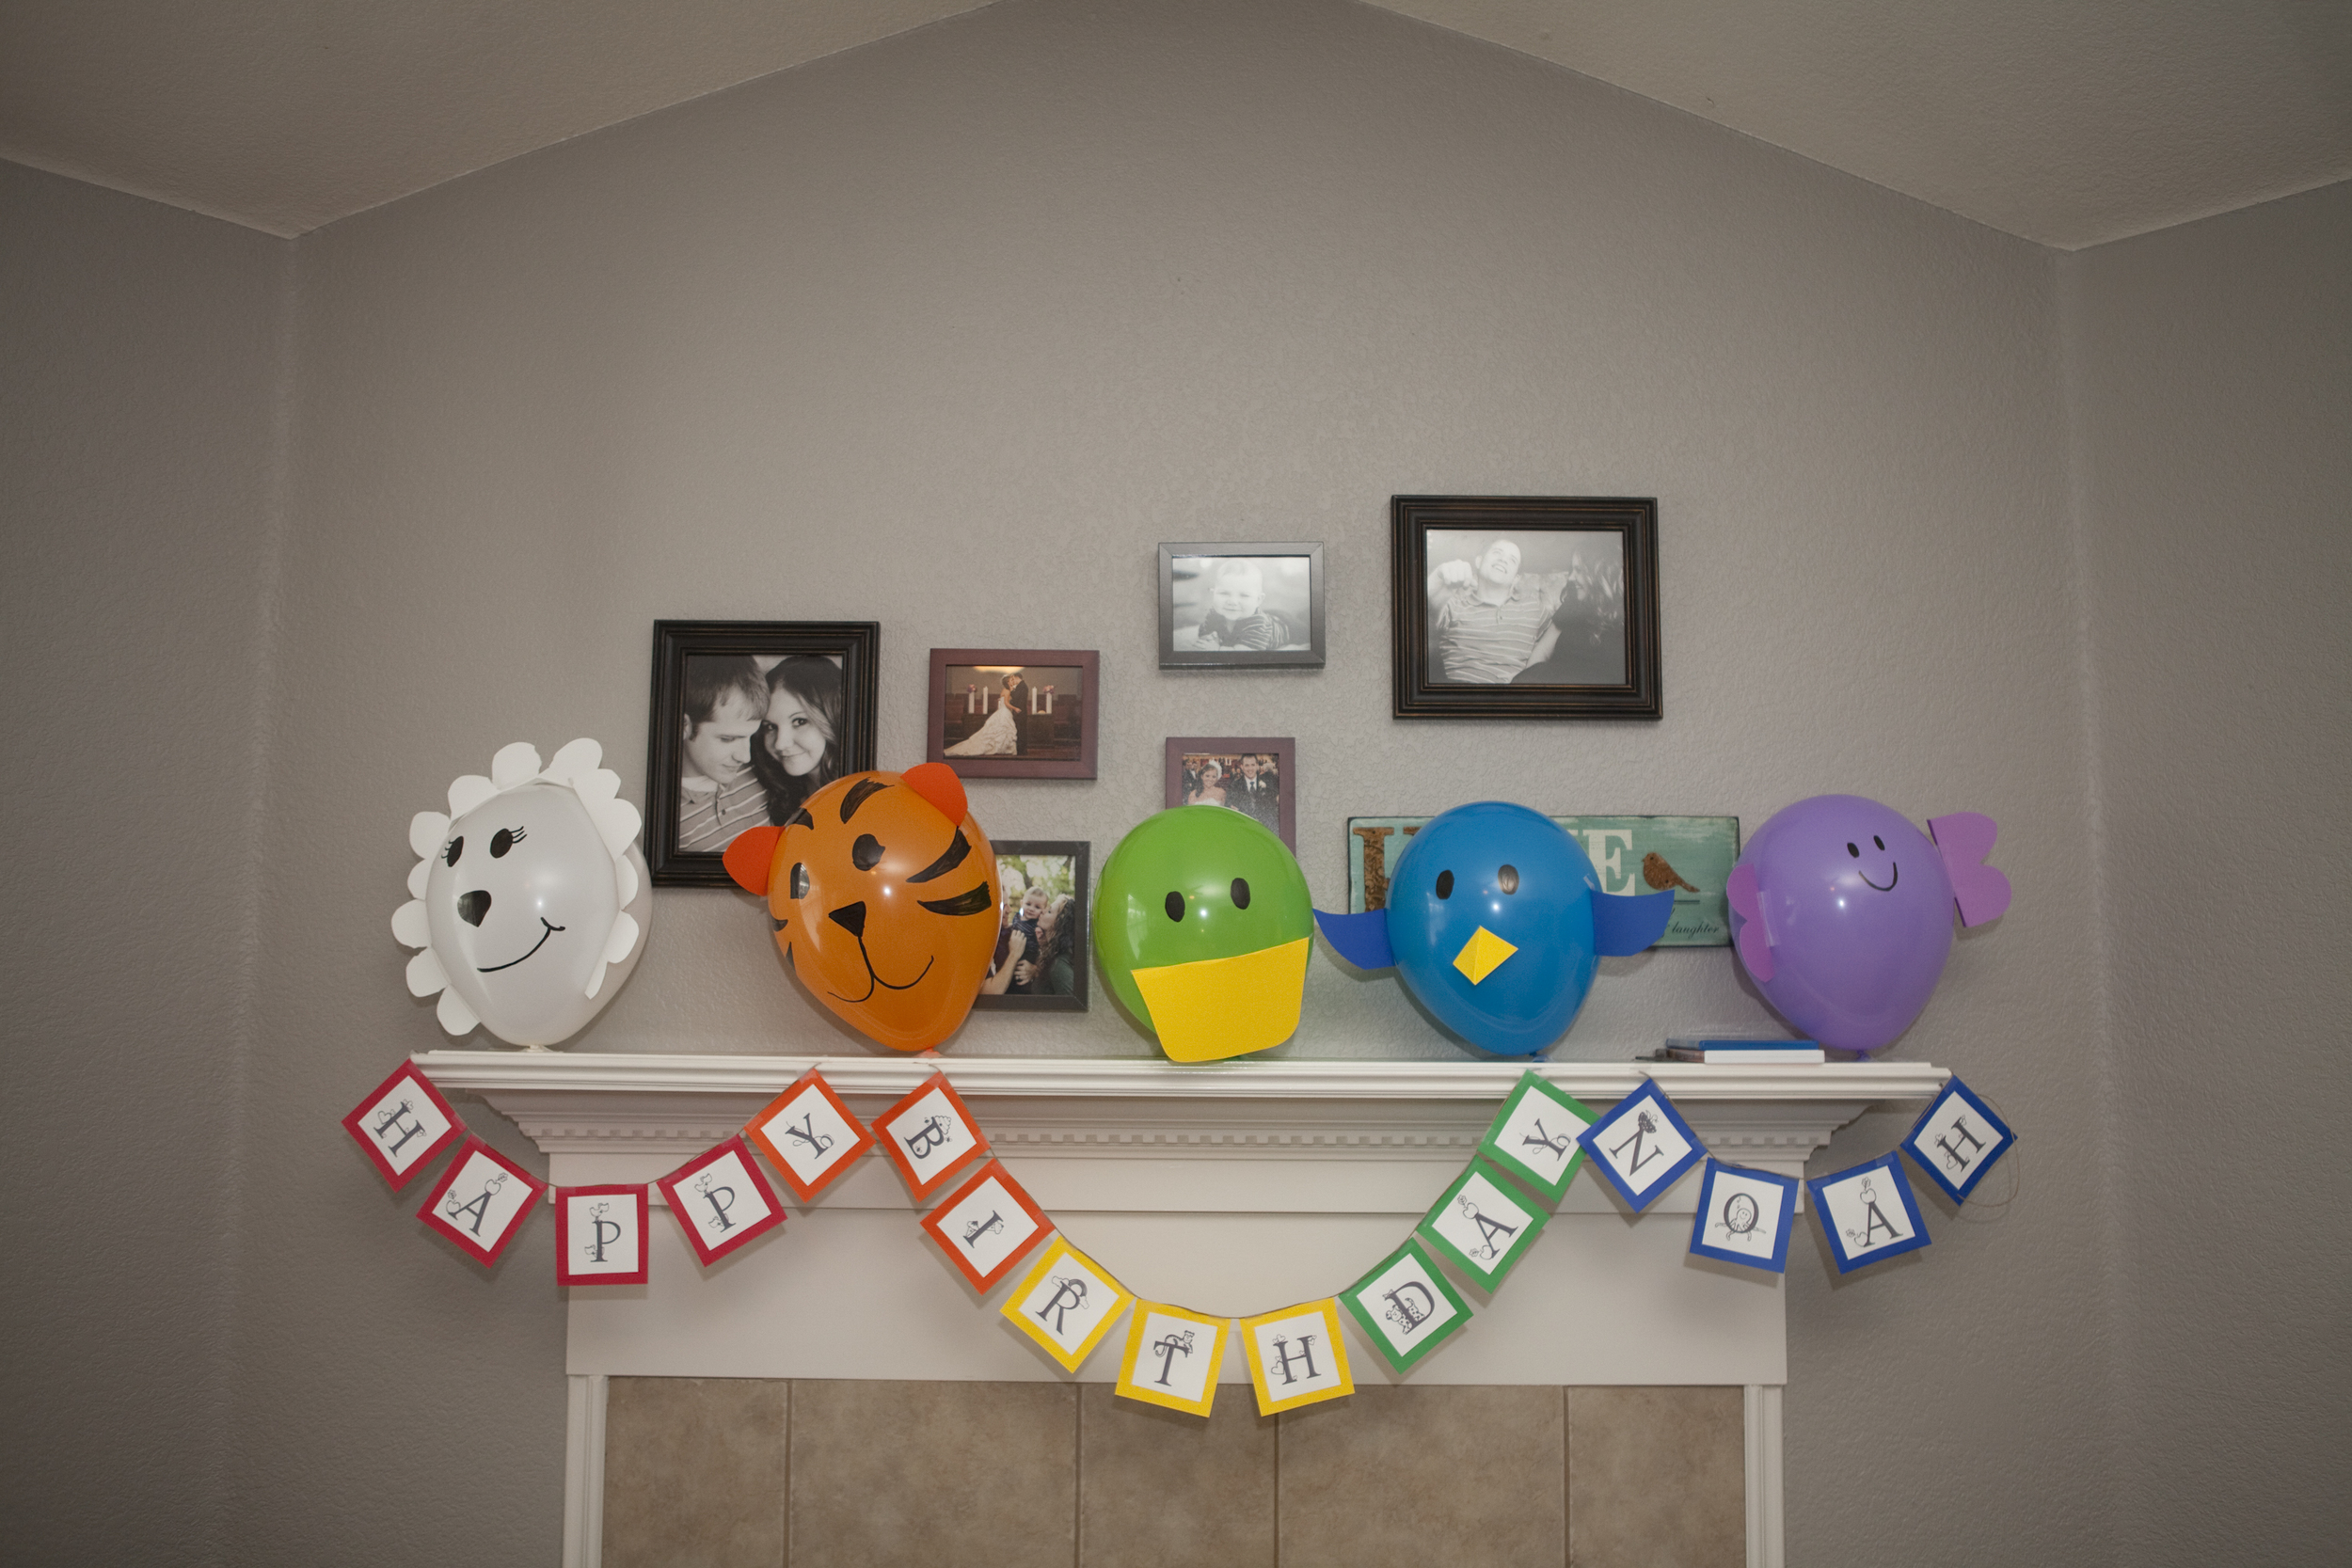 Main sign, animal balloons